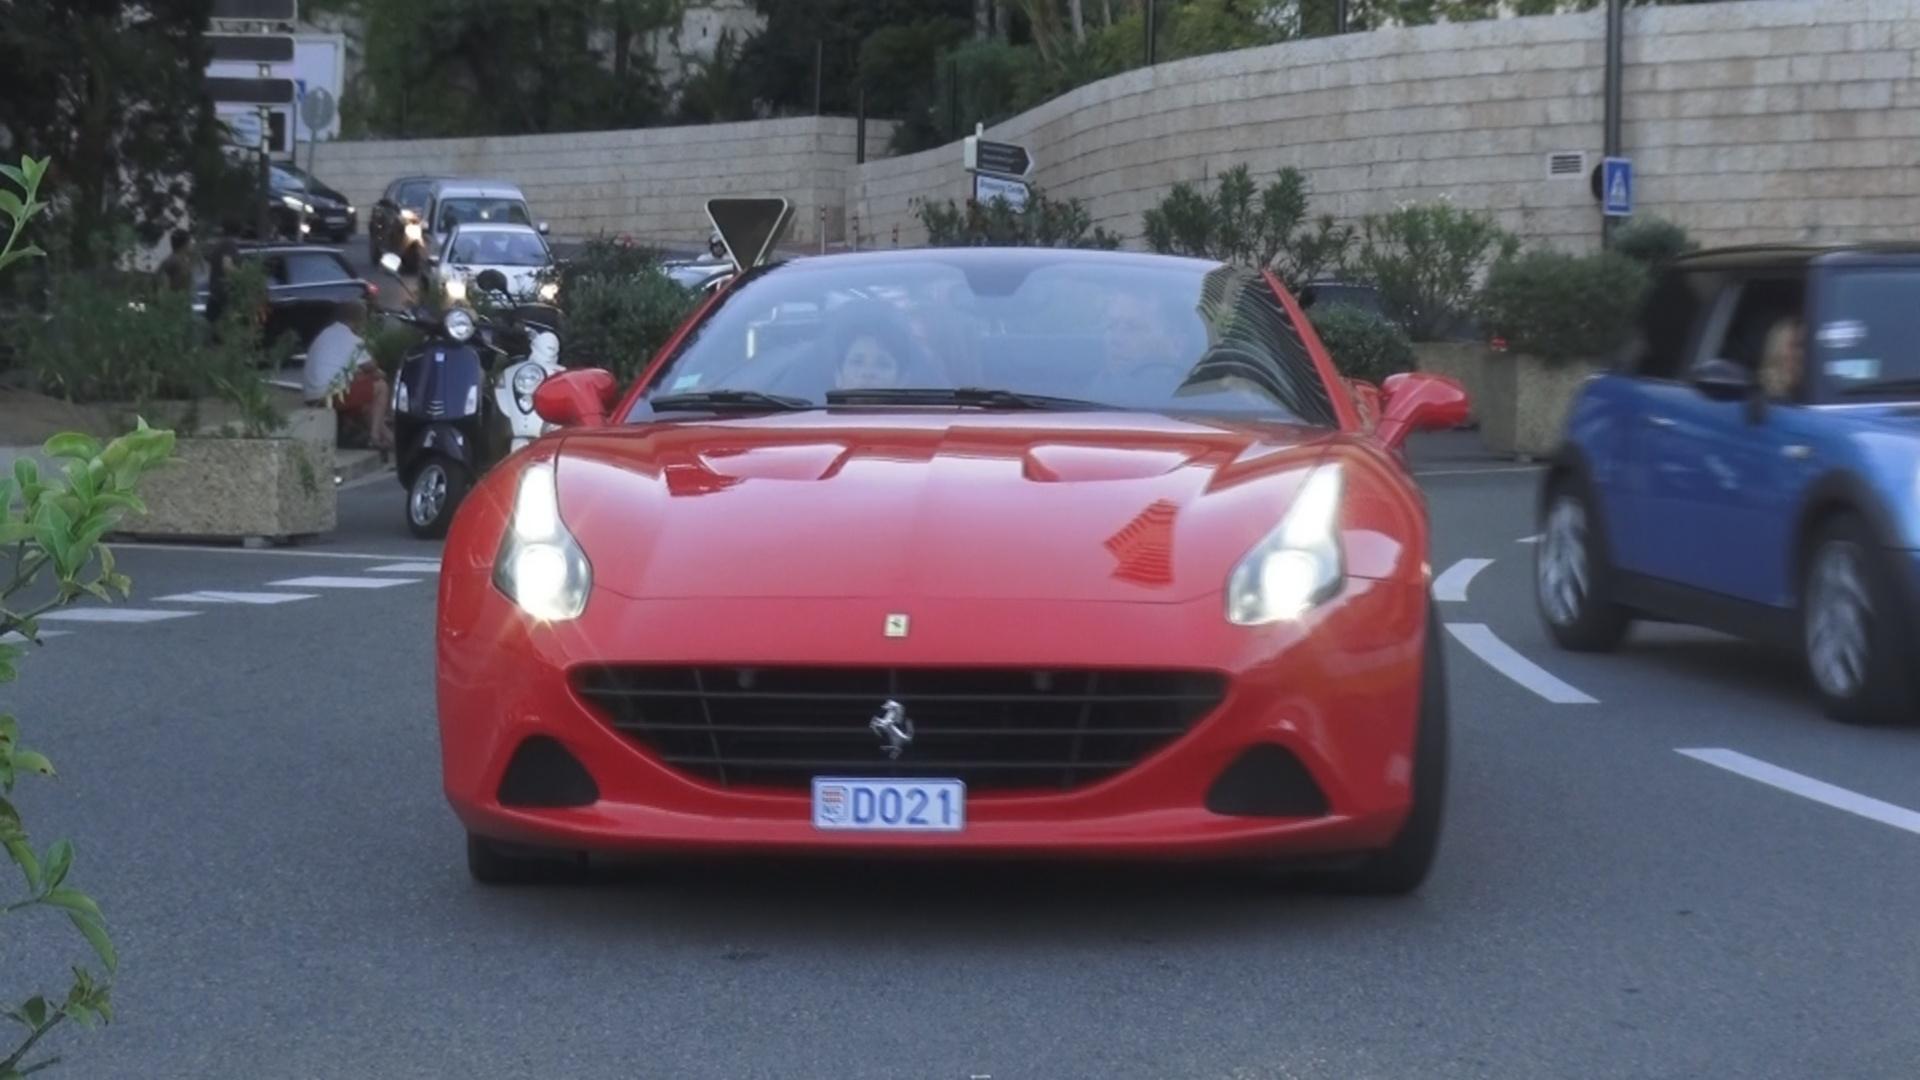 Ferrari California T - D021 (MC)